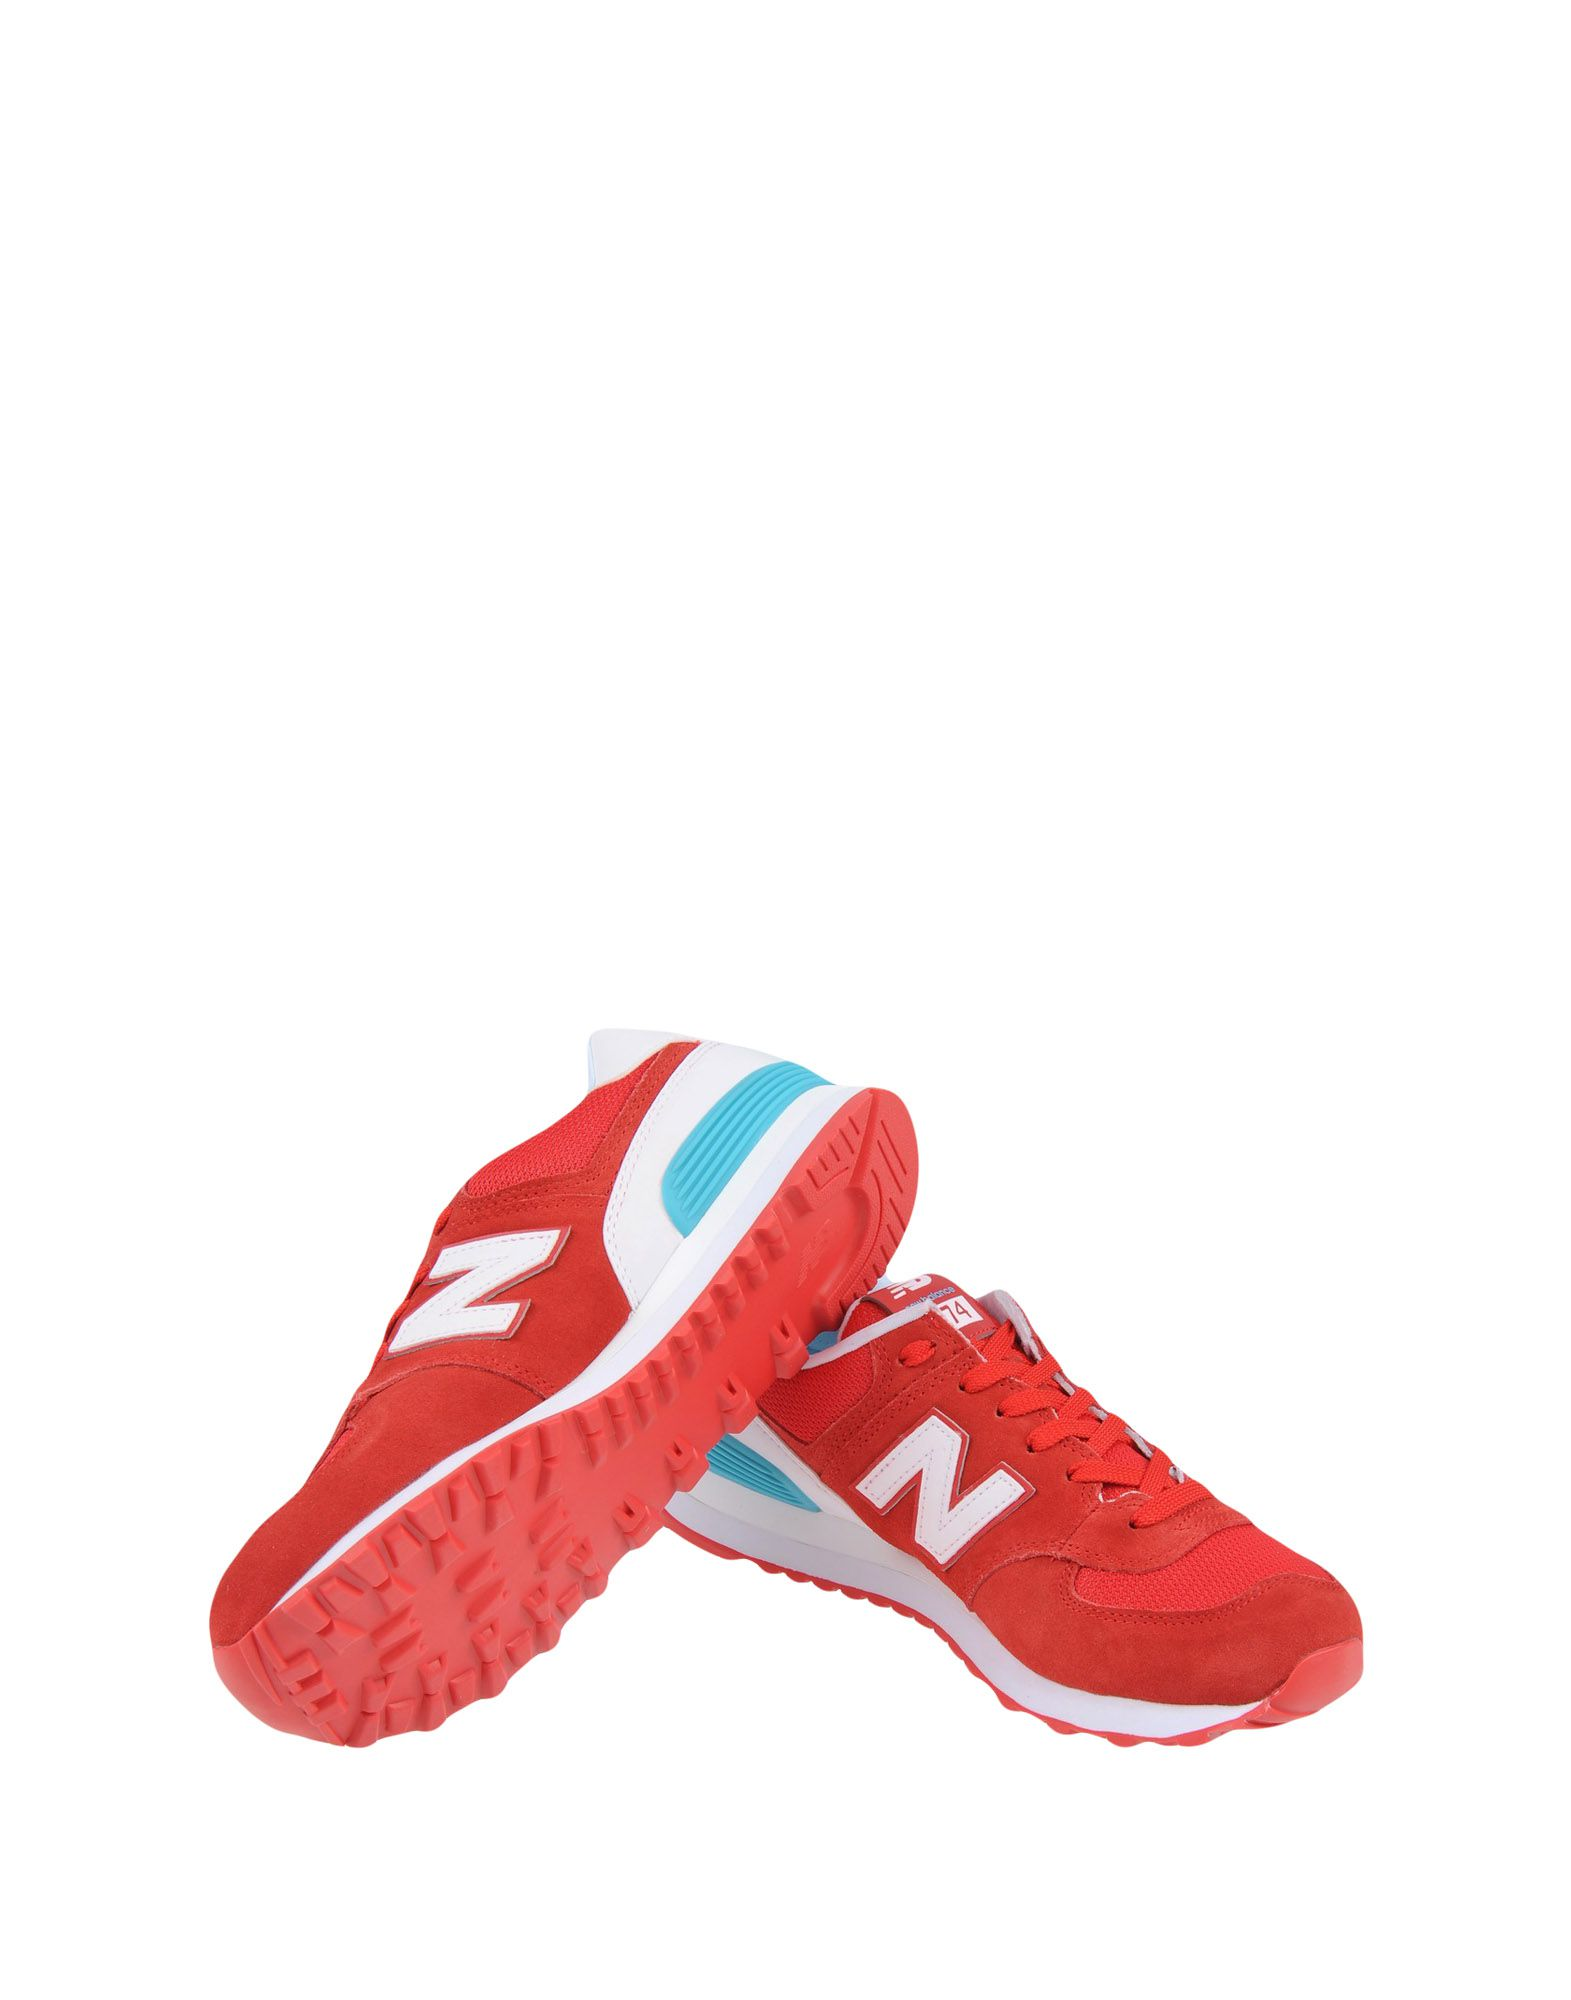 New Balance 11195912EU 574 Suede Mesh Seasonal 11195912EU Balance Gute Qualität beliebte Schuhe 1e83cf